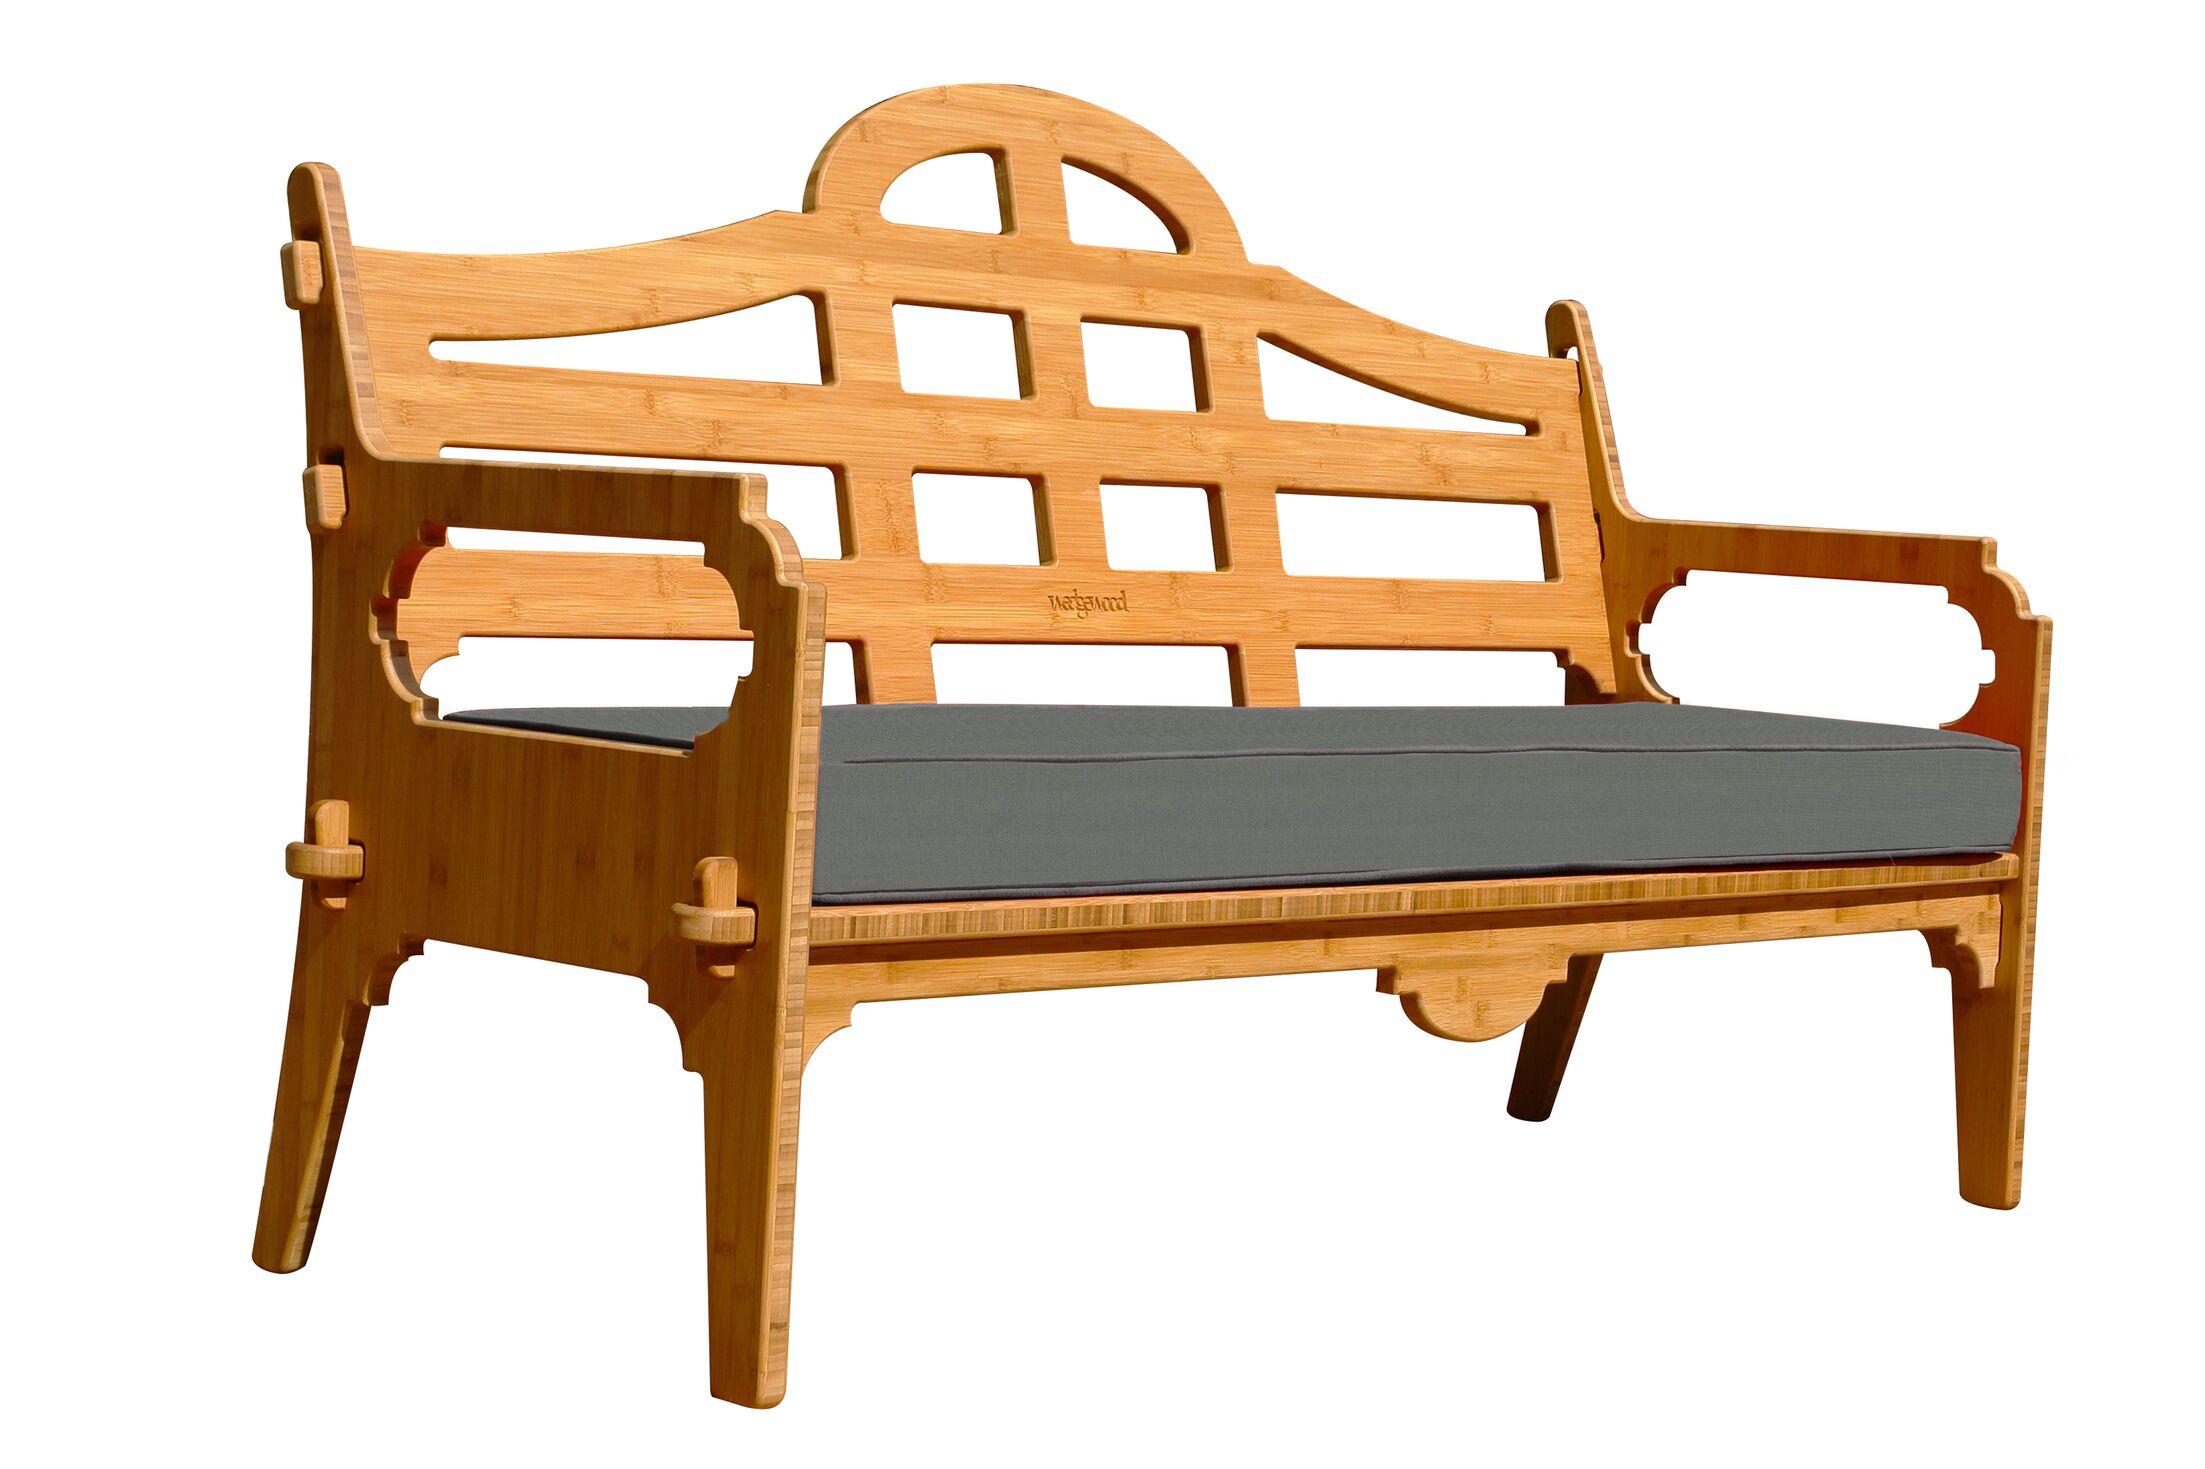 Burliegh Patio Sofa with Cushion Fabric: Charcoal